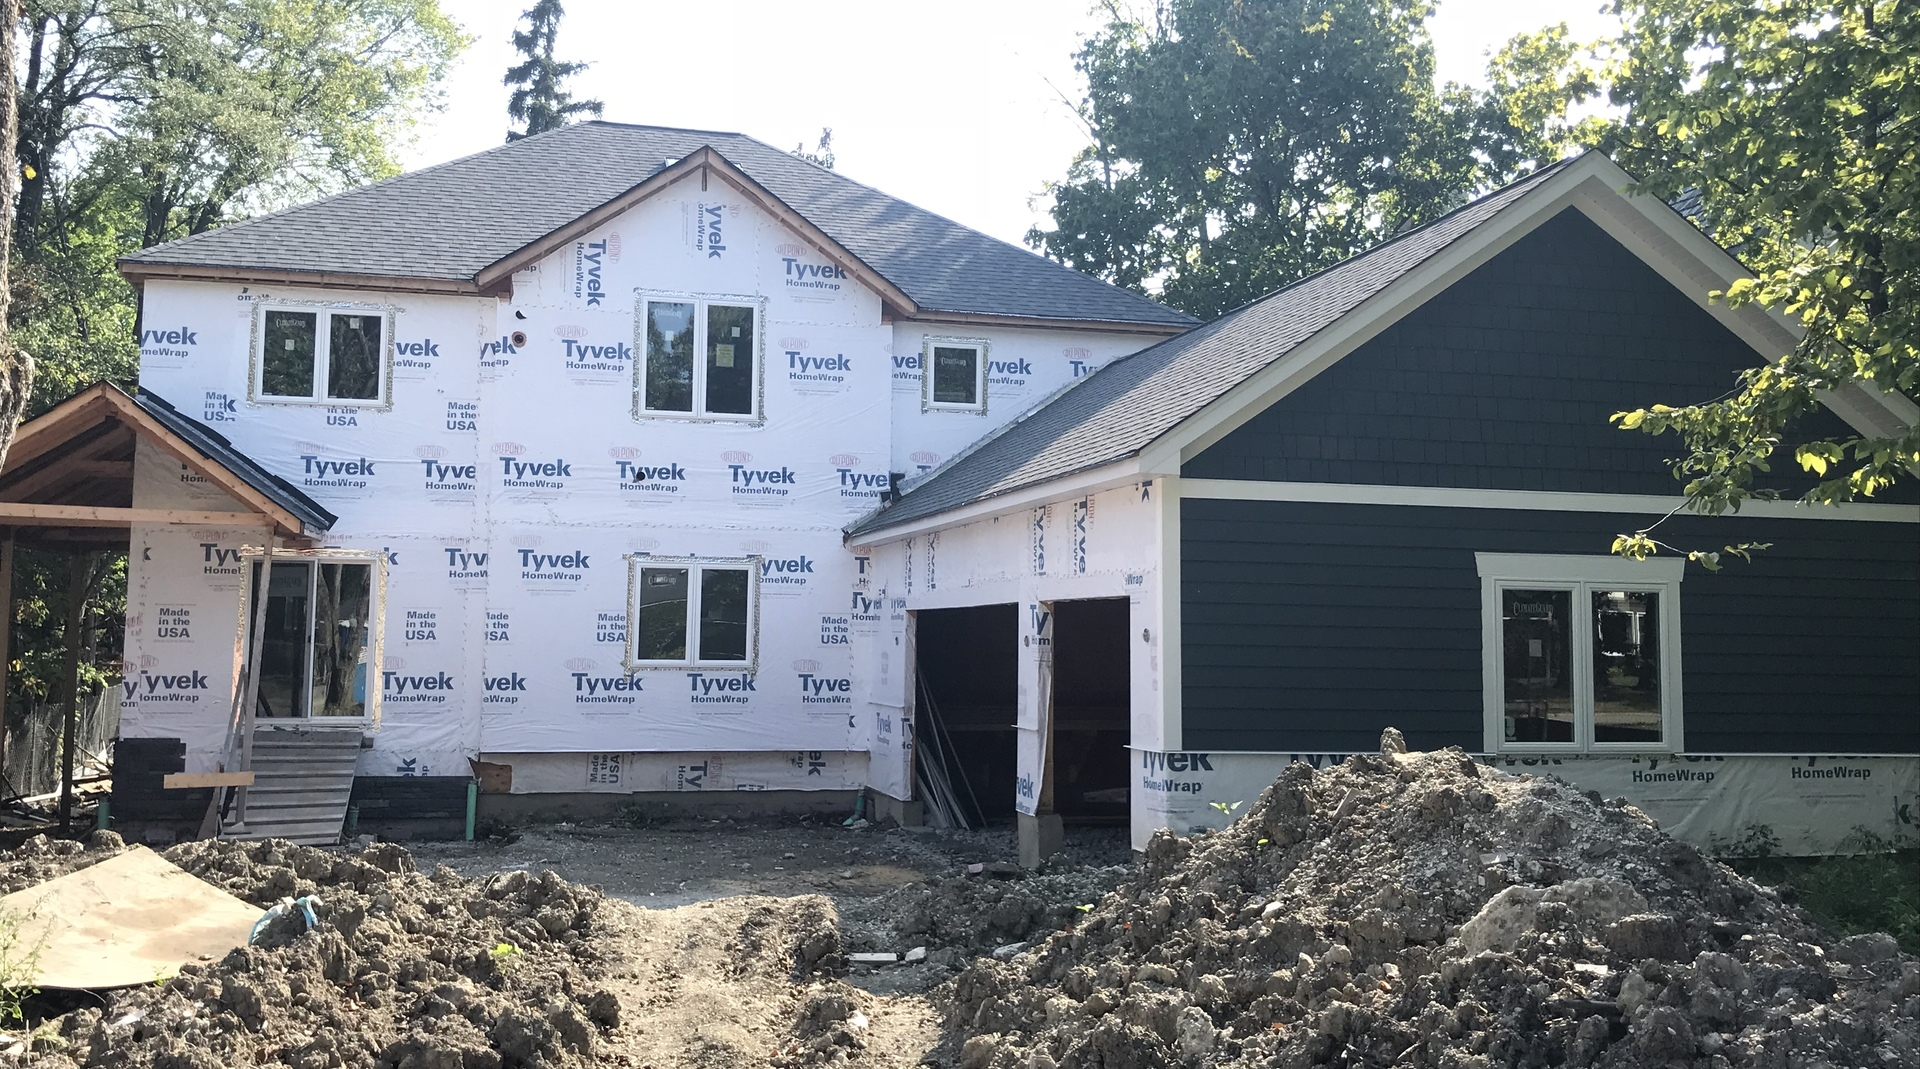 1351 Berkley, Deerfield, Illinois 60015